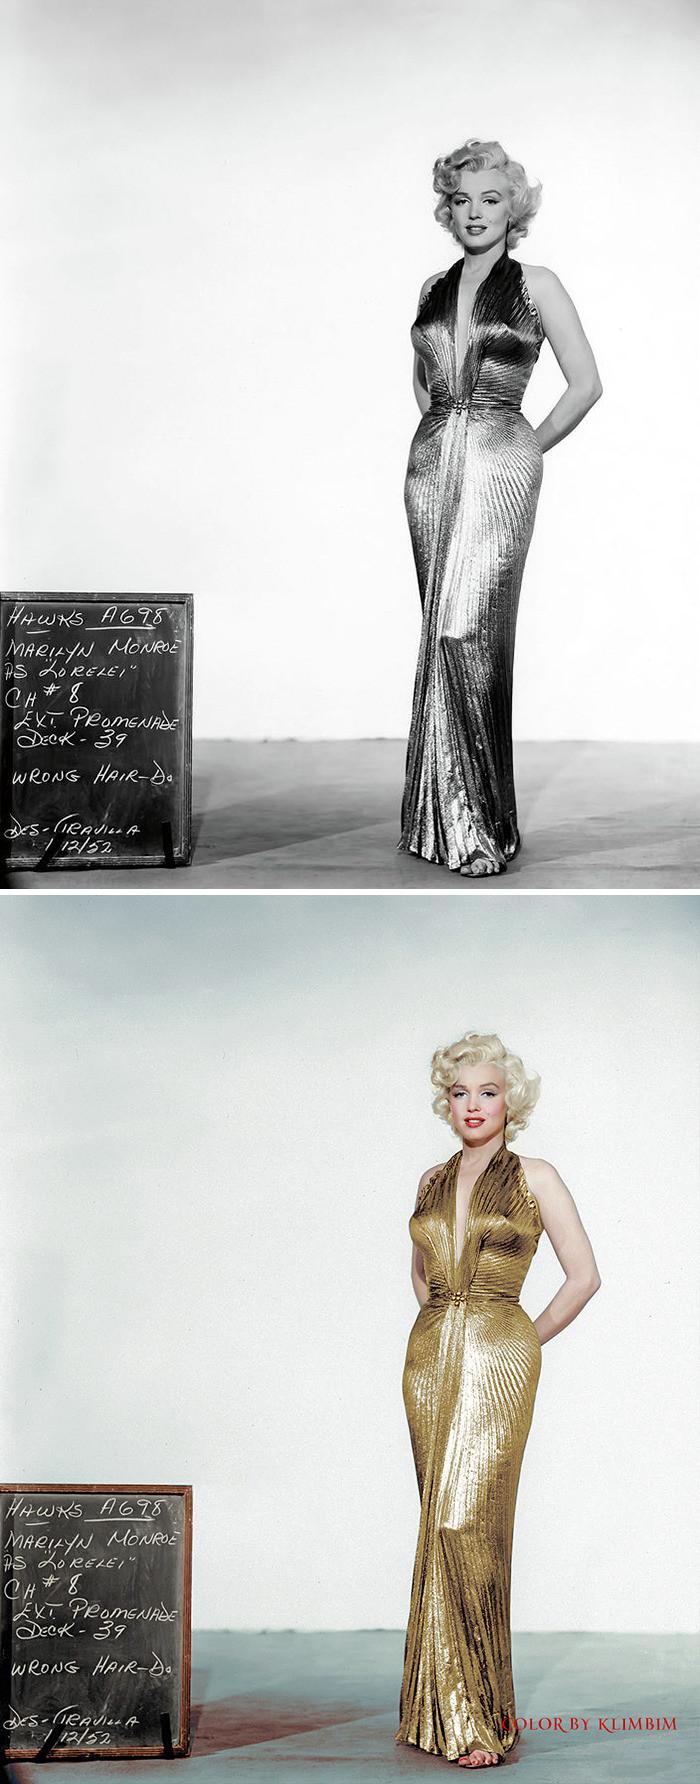 #25 Marilyn Monroe